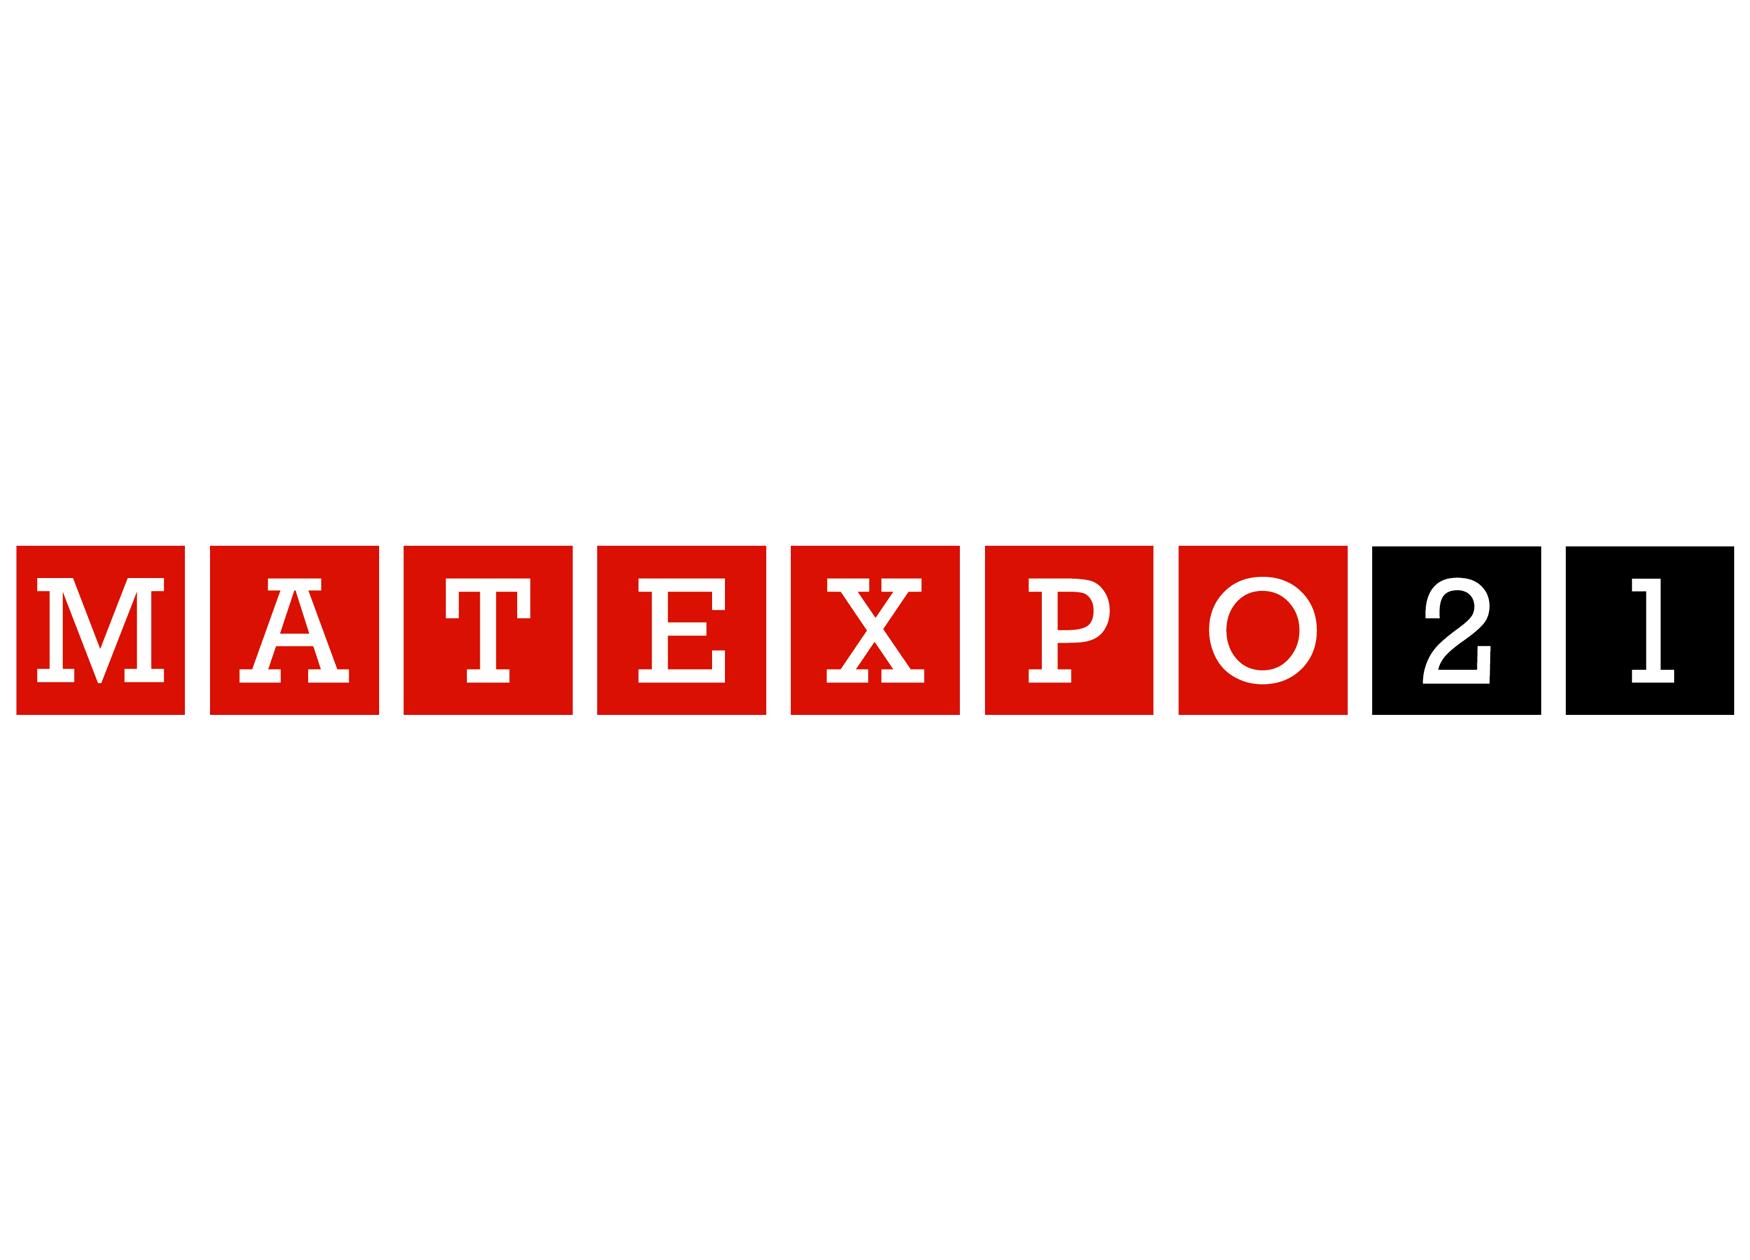 Easy Lift à MATEXPO 2021